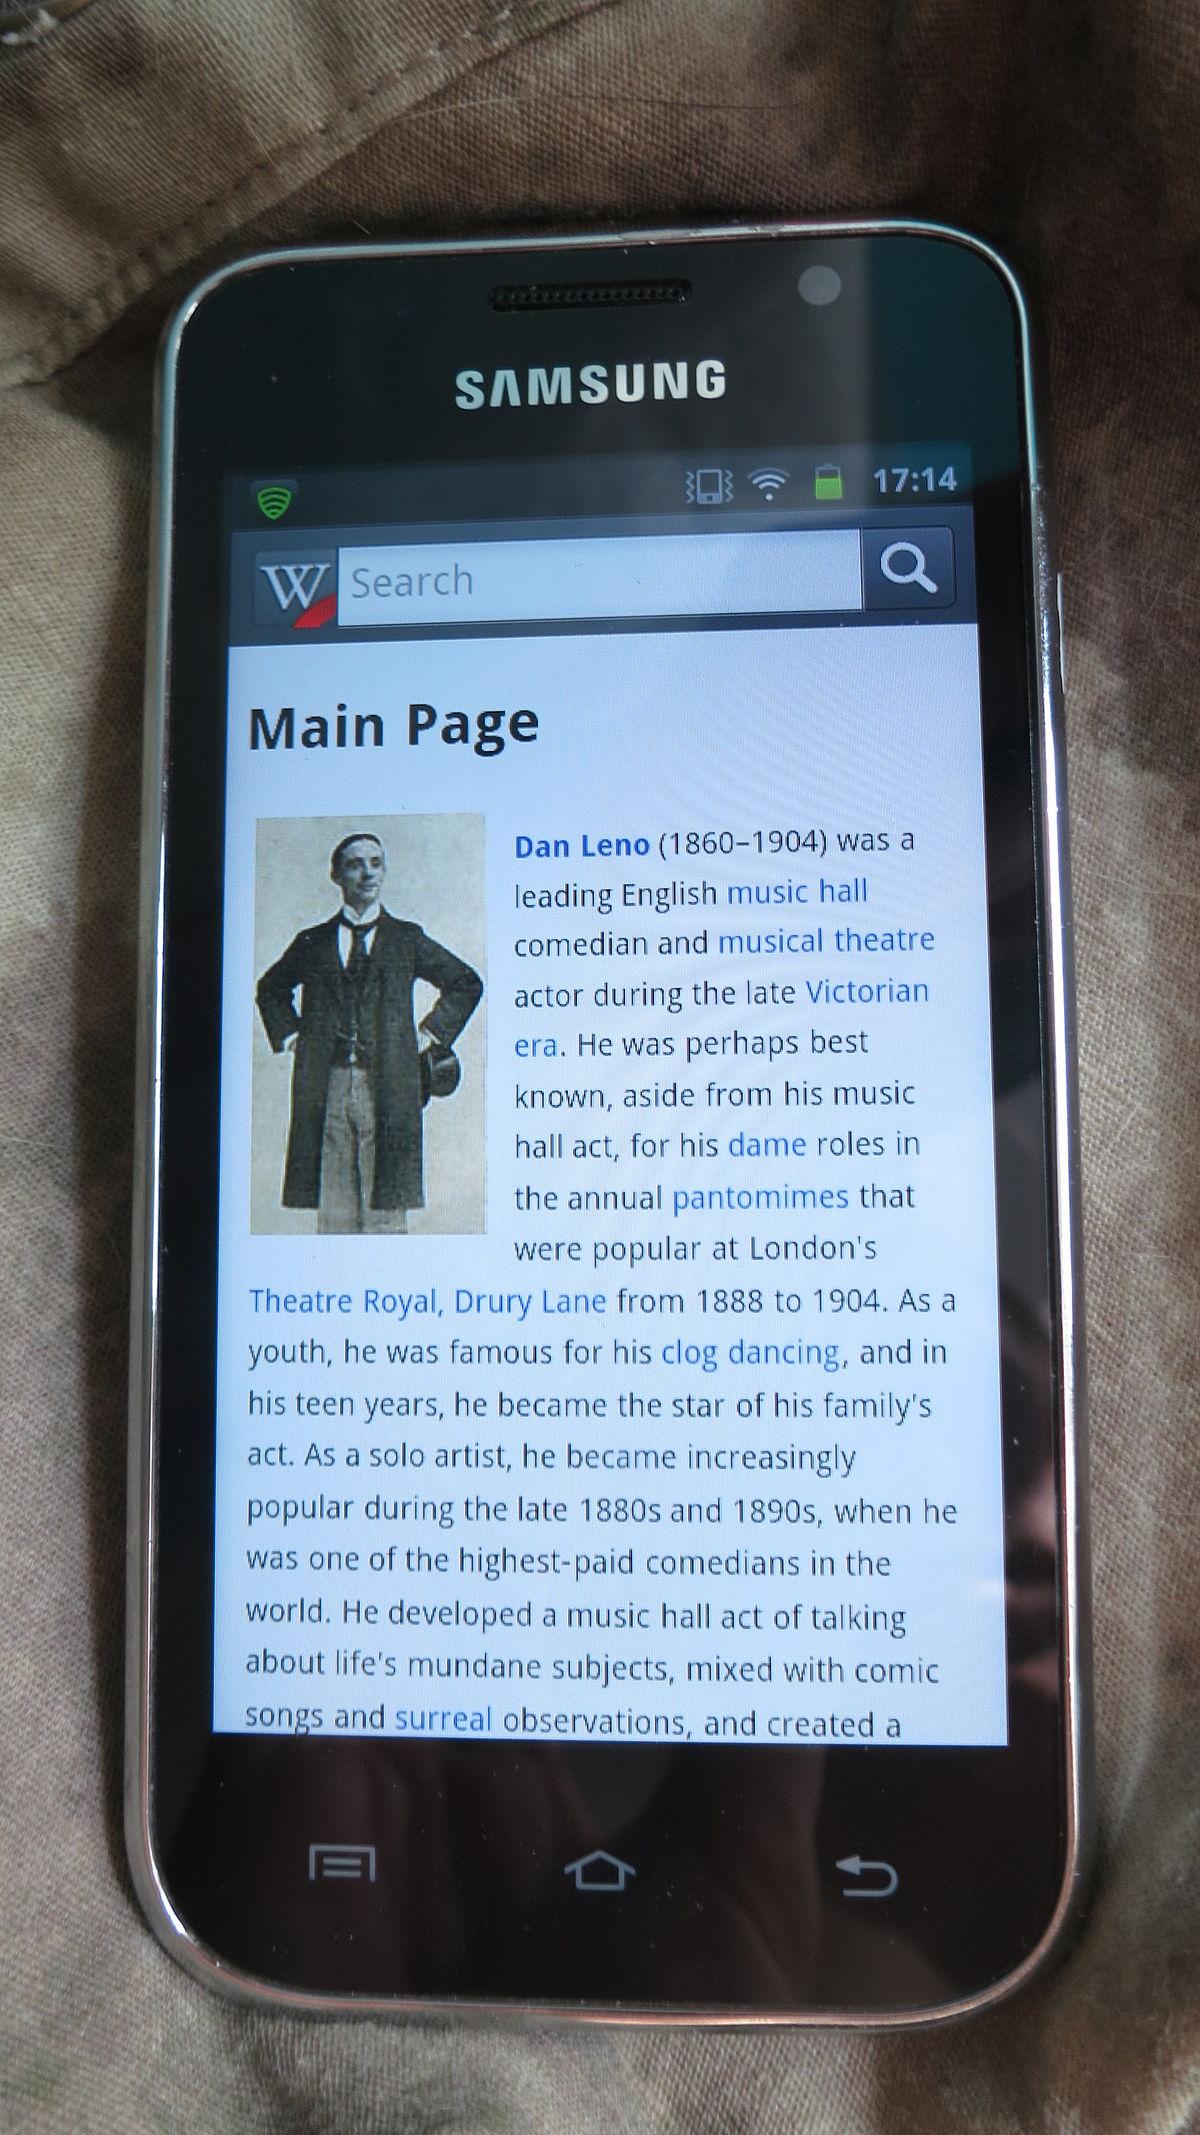 Samsung Galaxy Player - Wikipedia